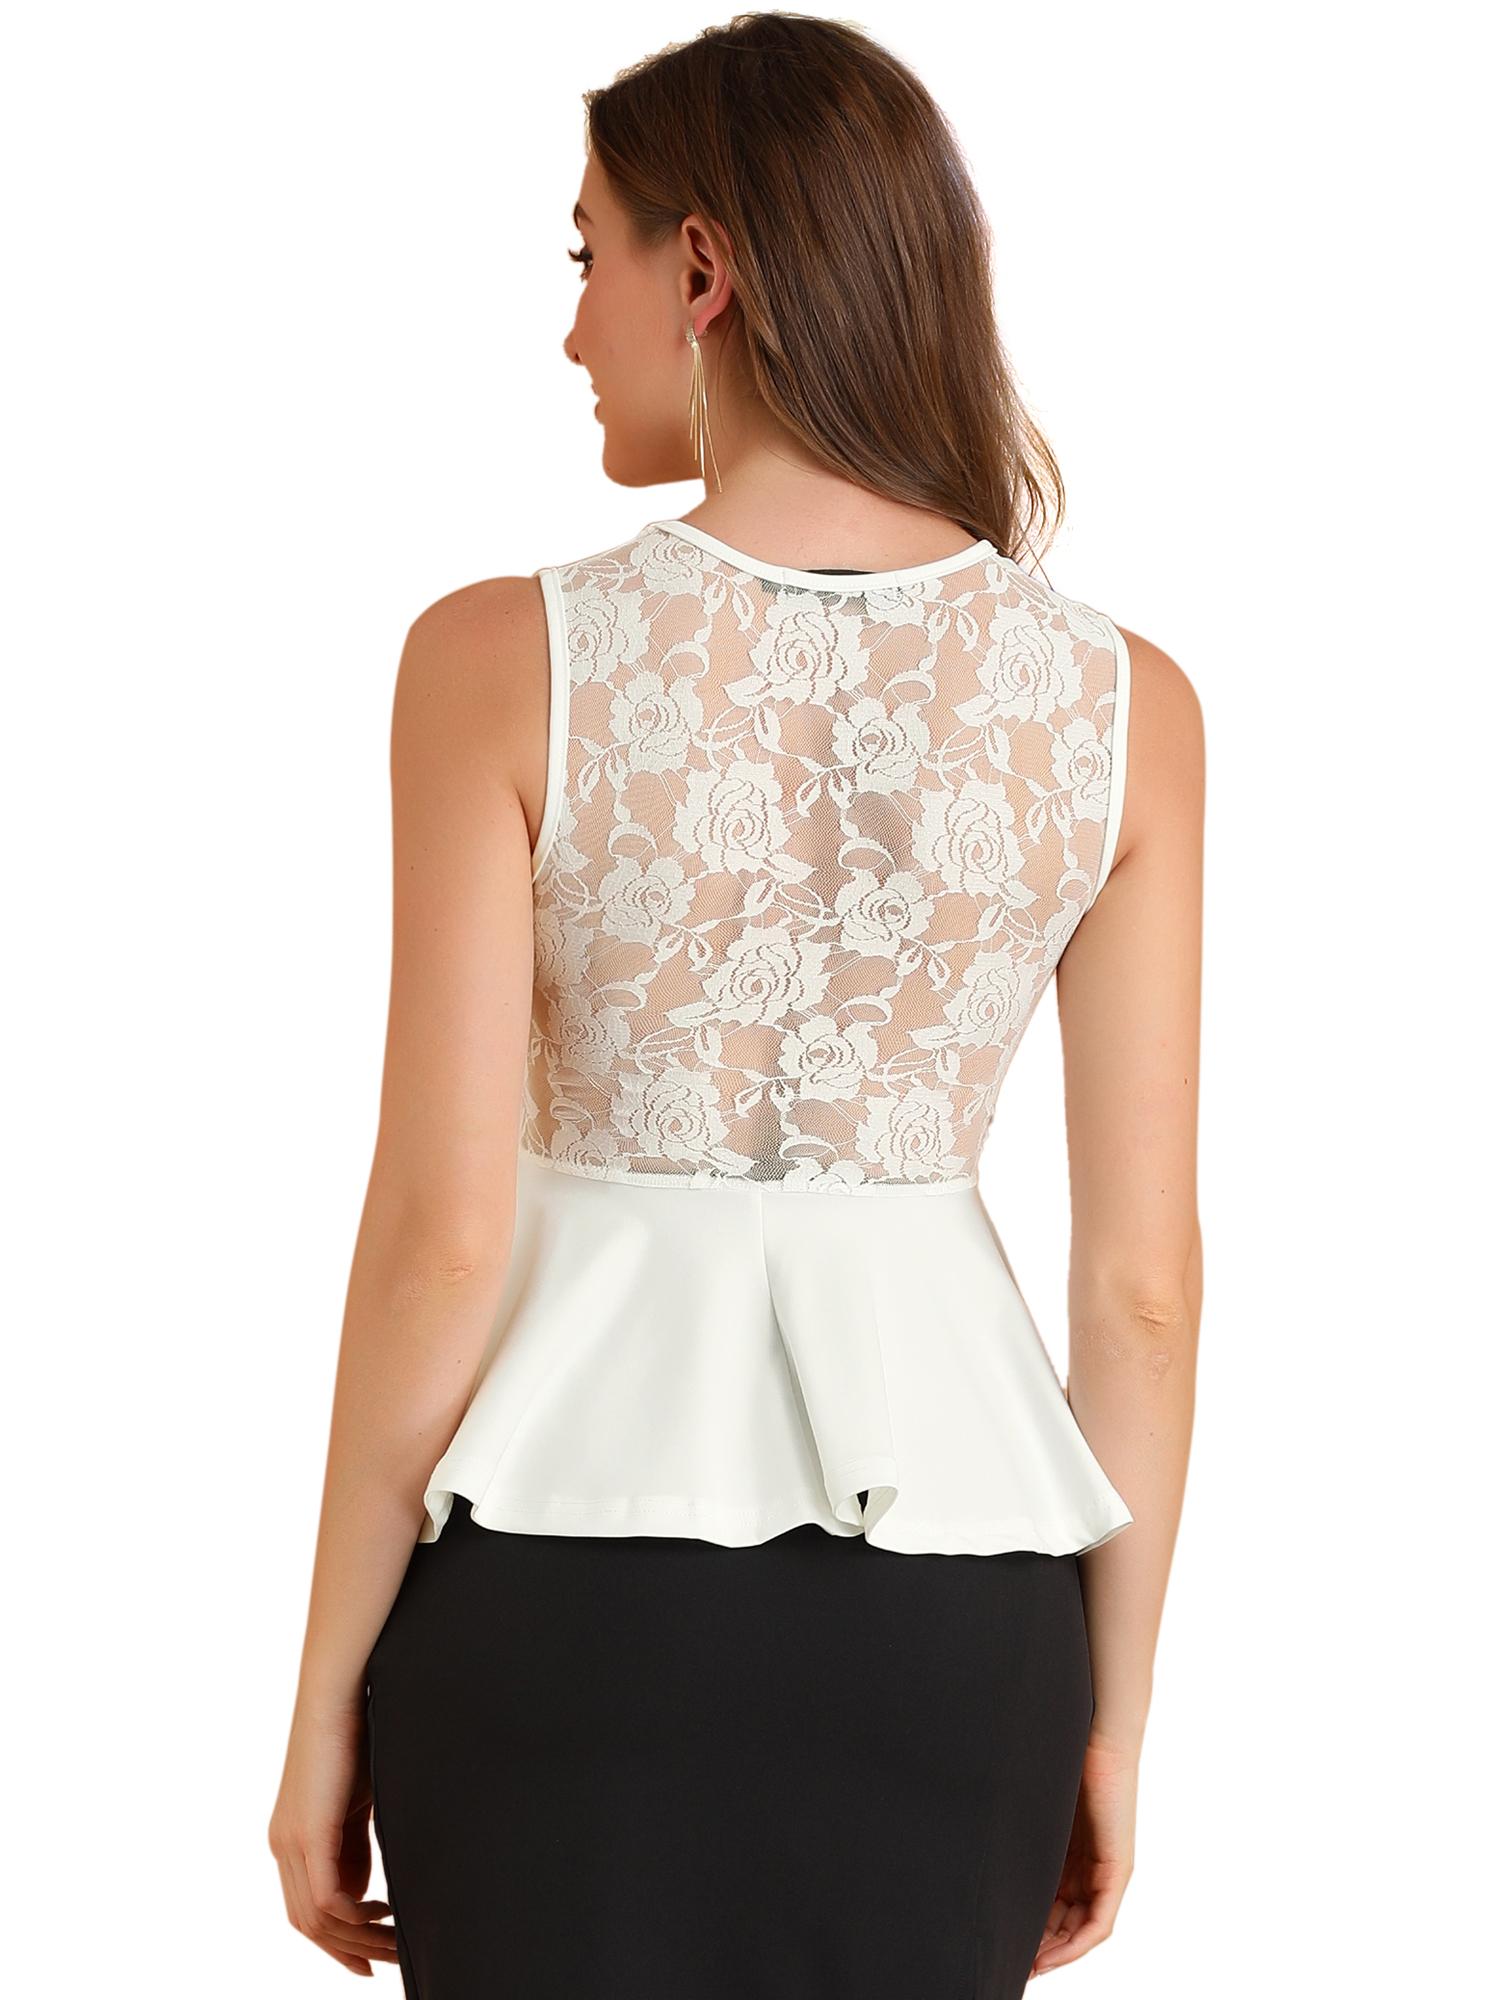 Women Round Neck Lace-Paneled Sleeveless Peplum Top White XS